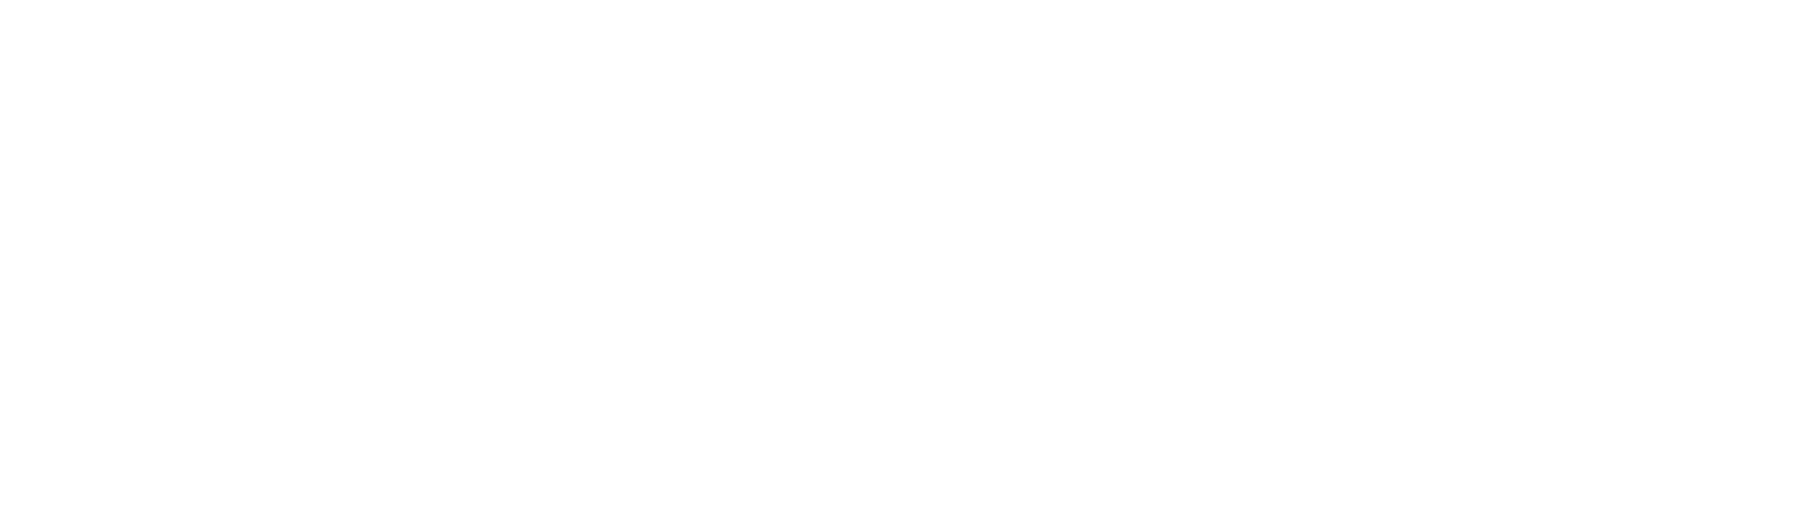 Pandora Vestibulares